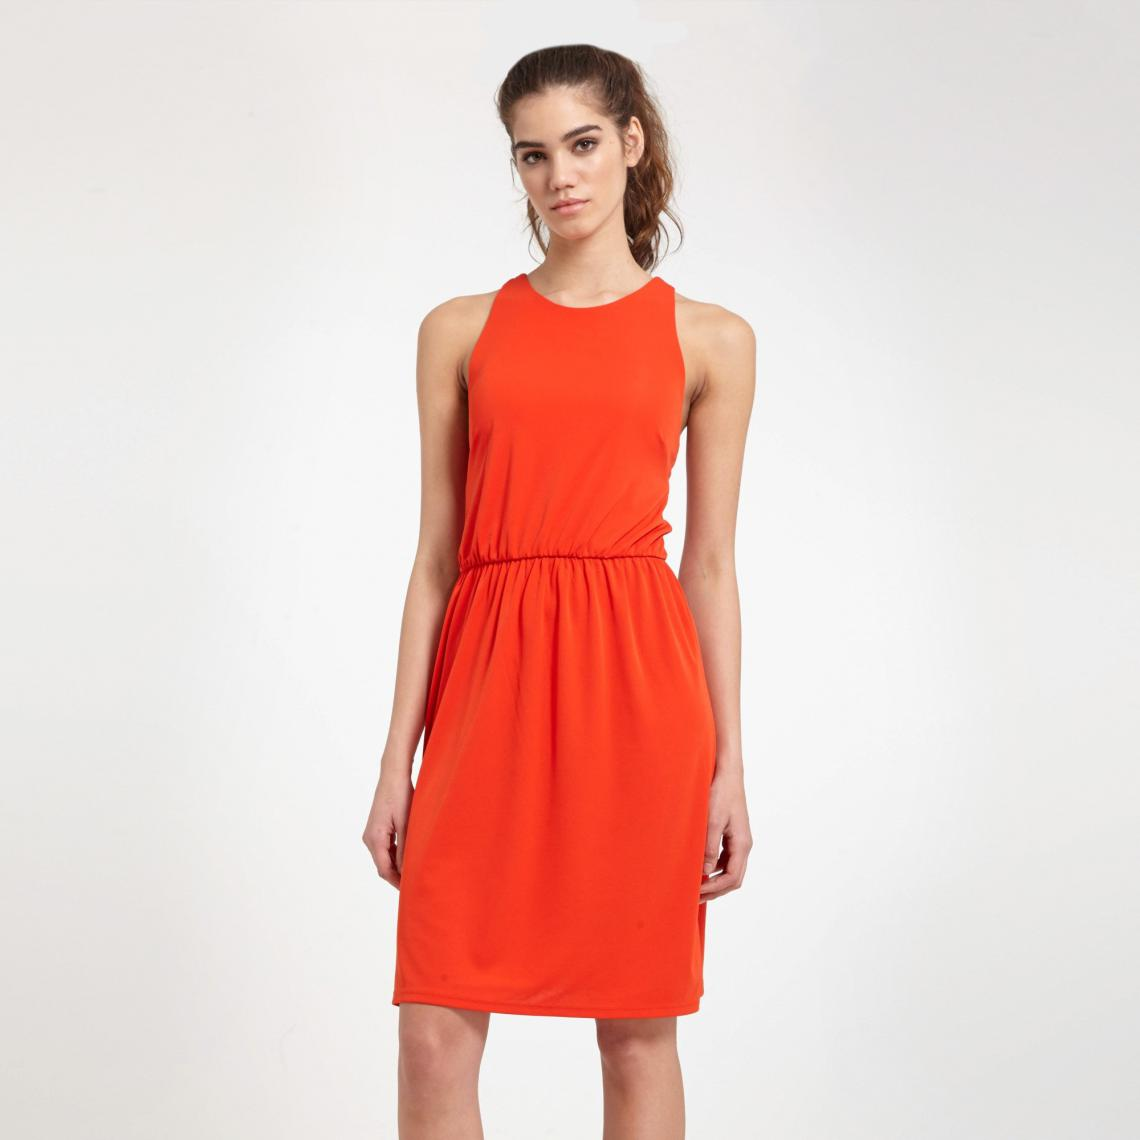 e29b573e2f7 Robe courte femme Morgan - Orange Morgan Femme